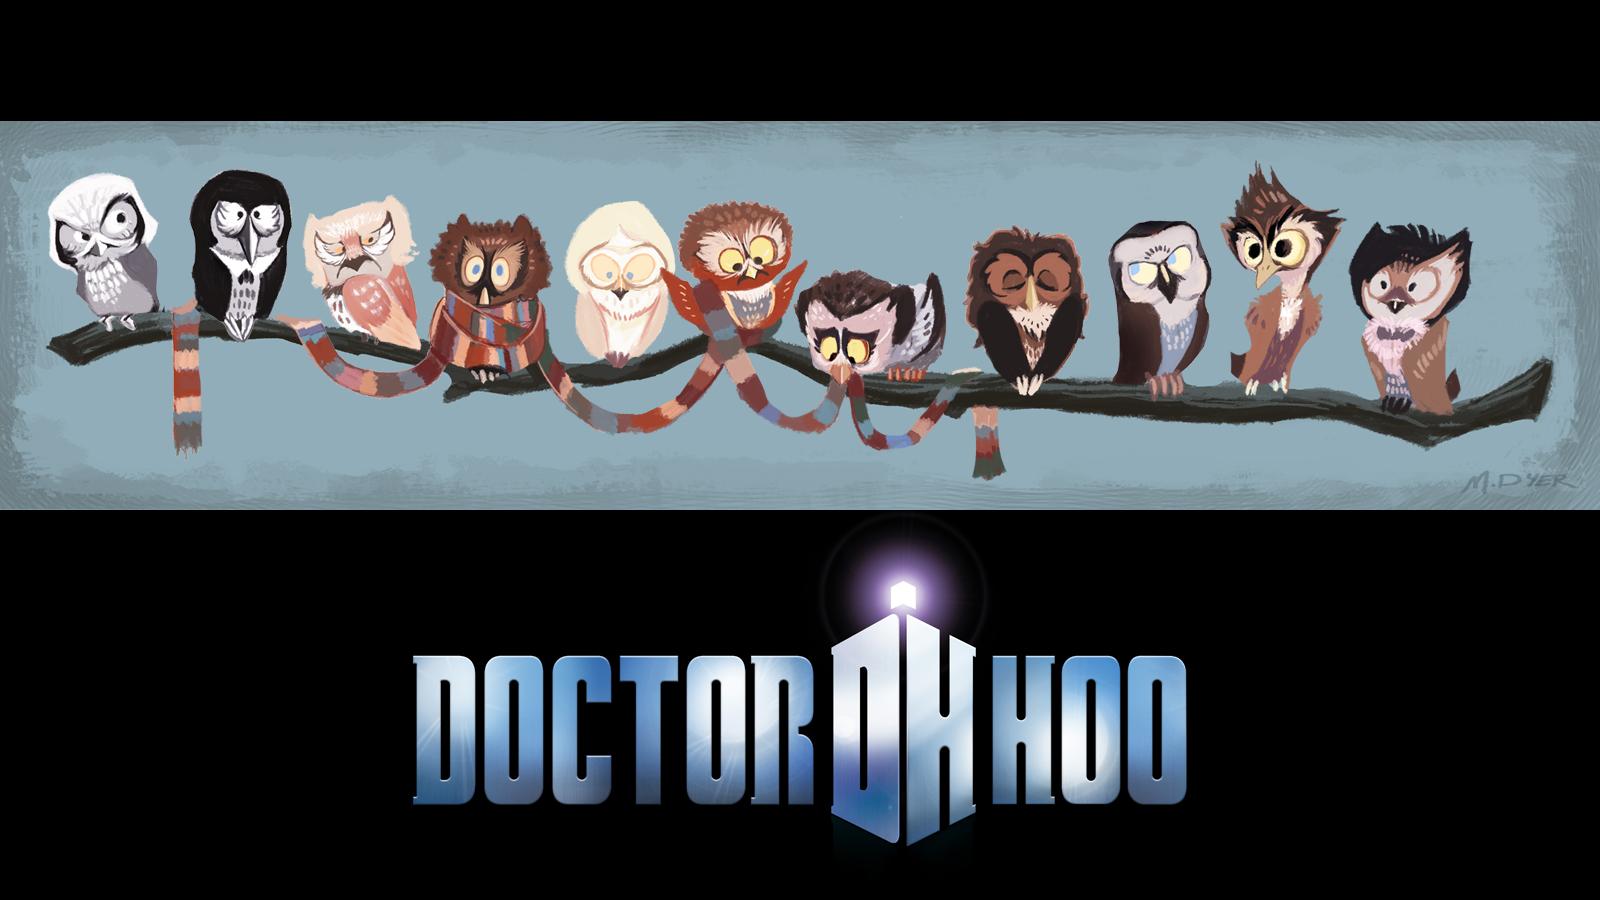 El viajero de Gallifrey - Página 3 Doctor_hoo_desktop_wallpaper_by_greenarcheralchemist-d3h14hr